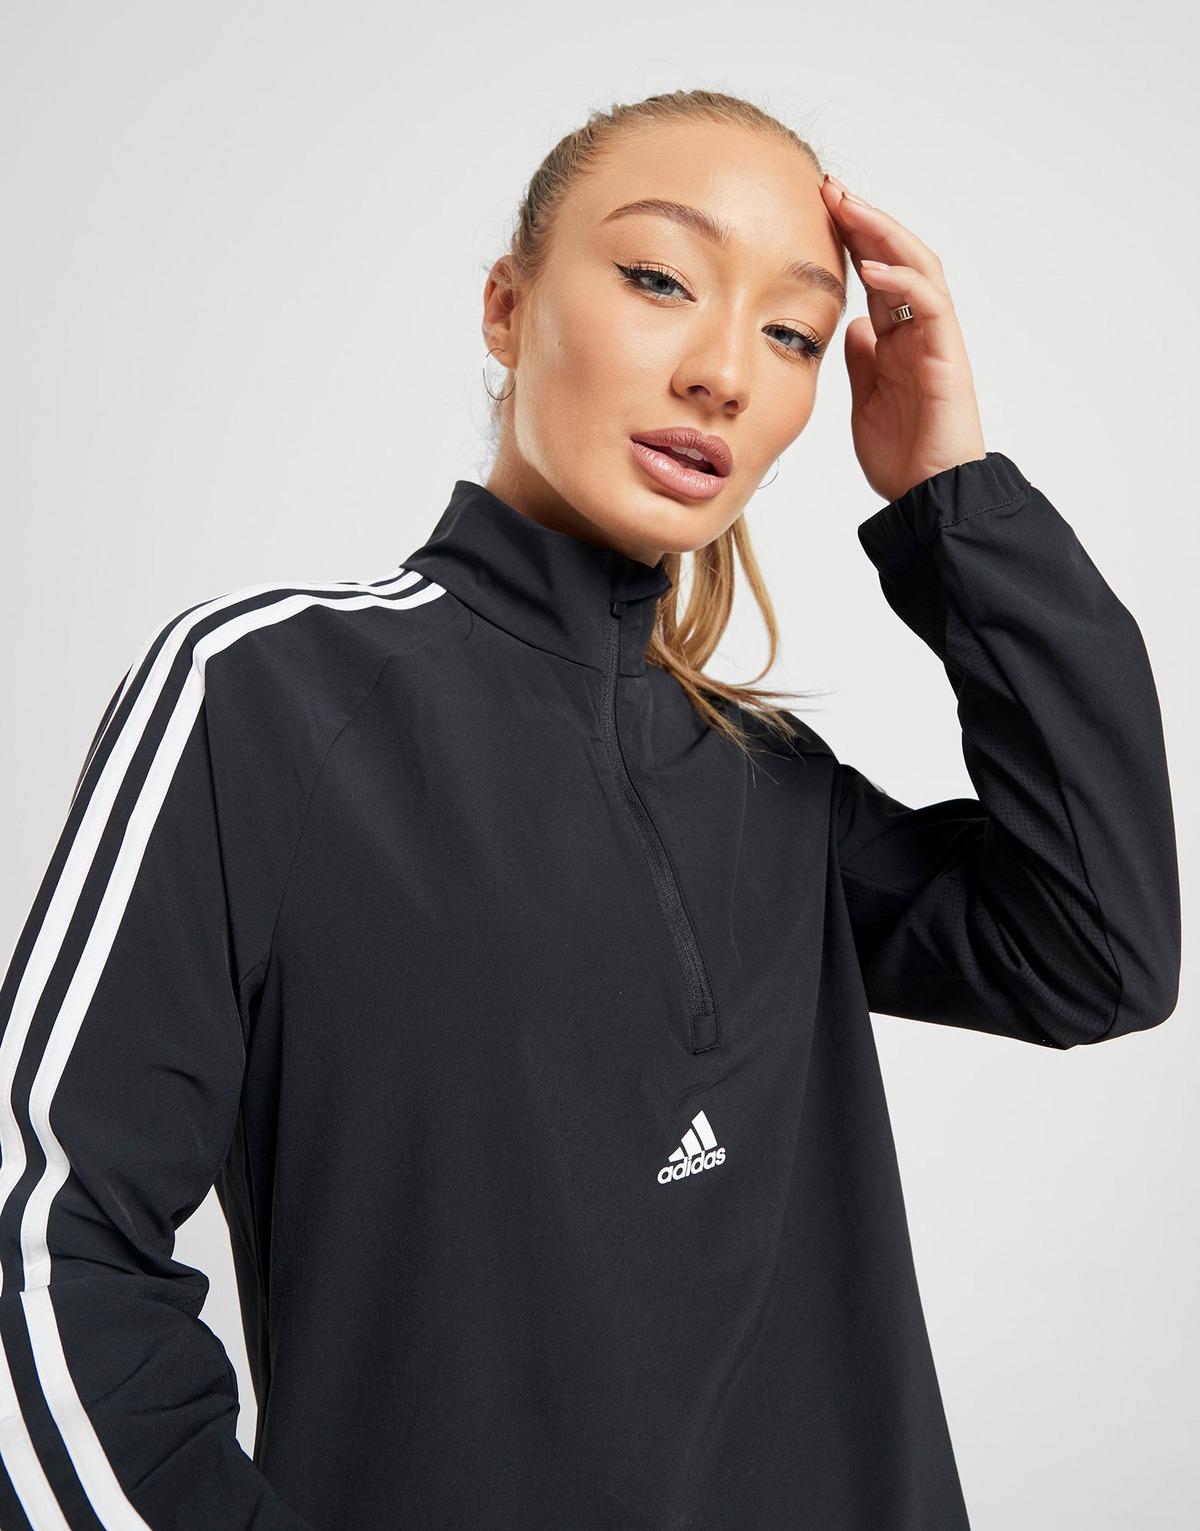 Adidas 3-stripes Woven 1/4 Zip Jacket